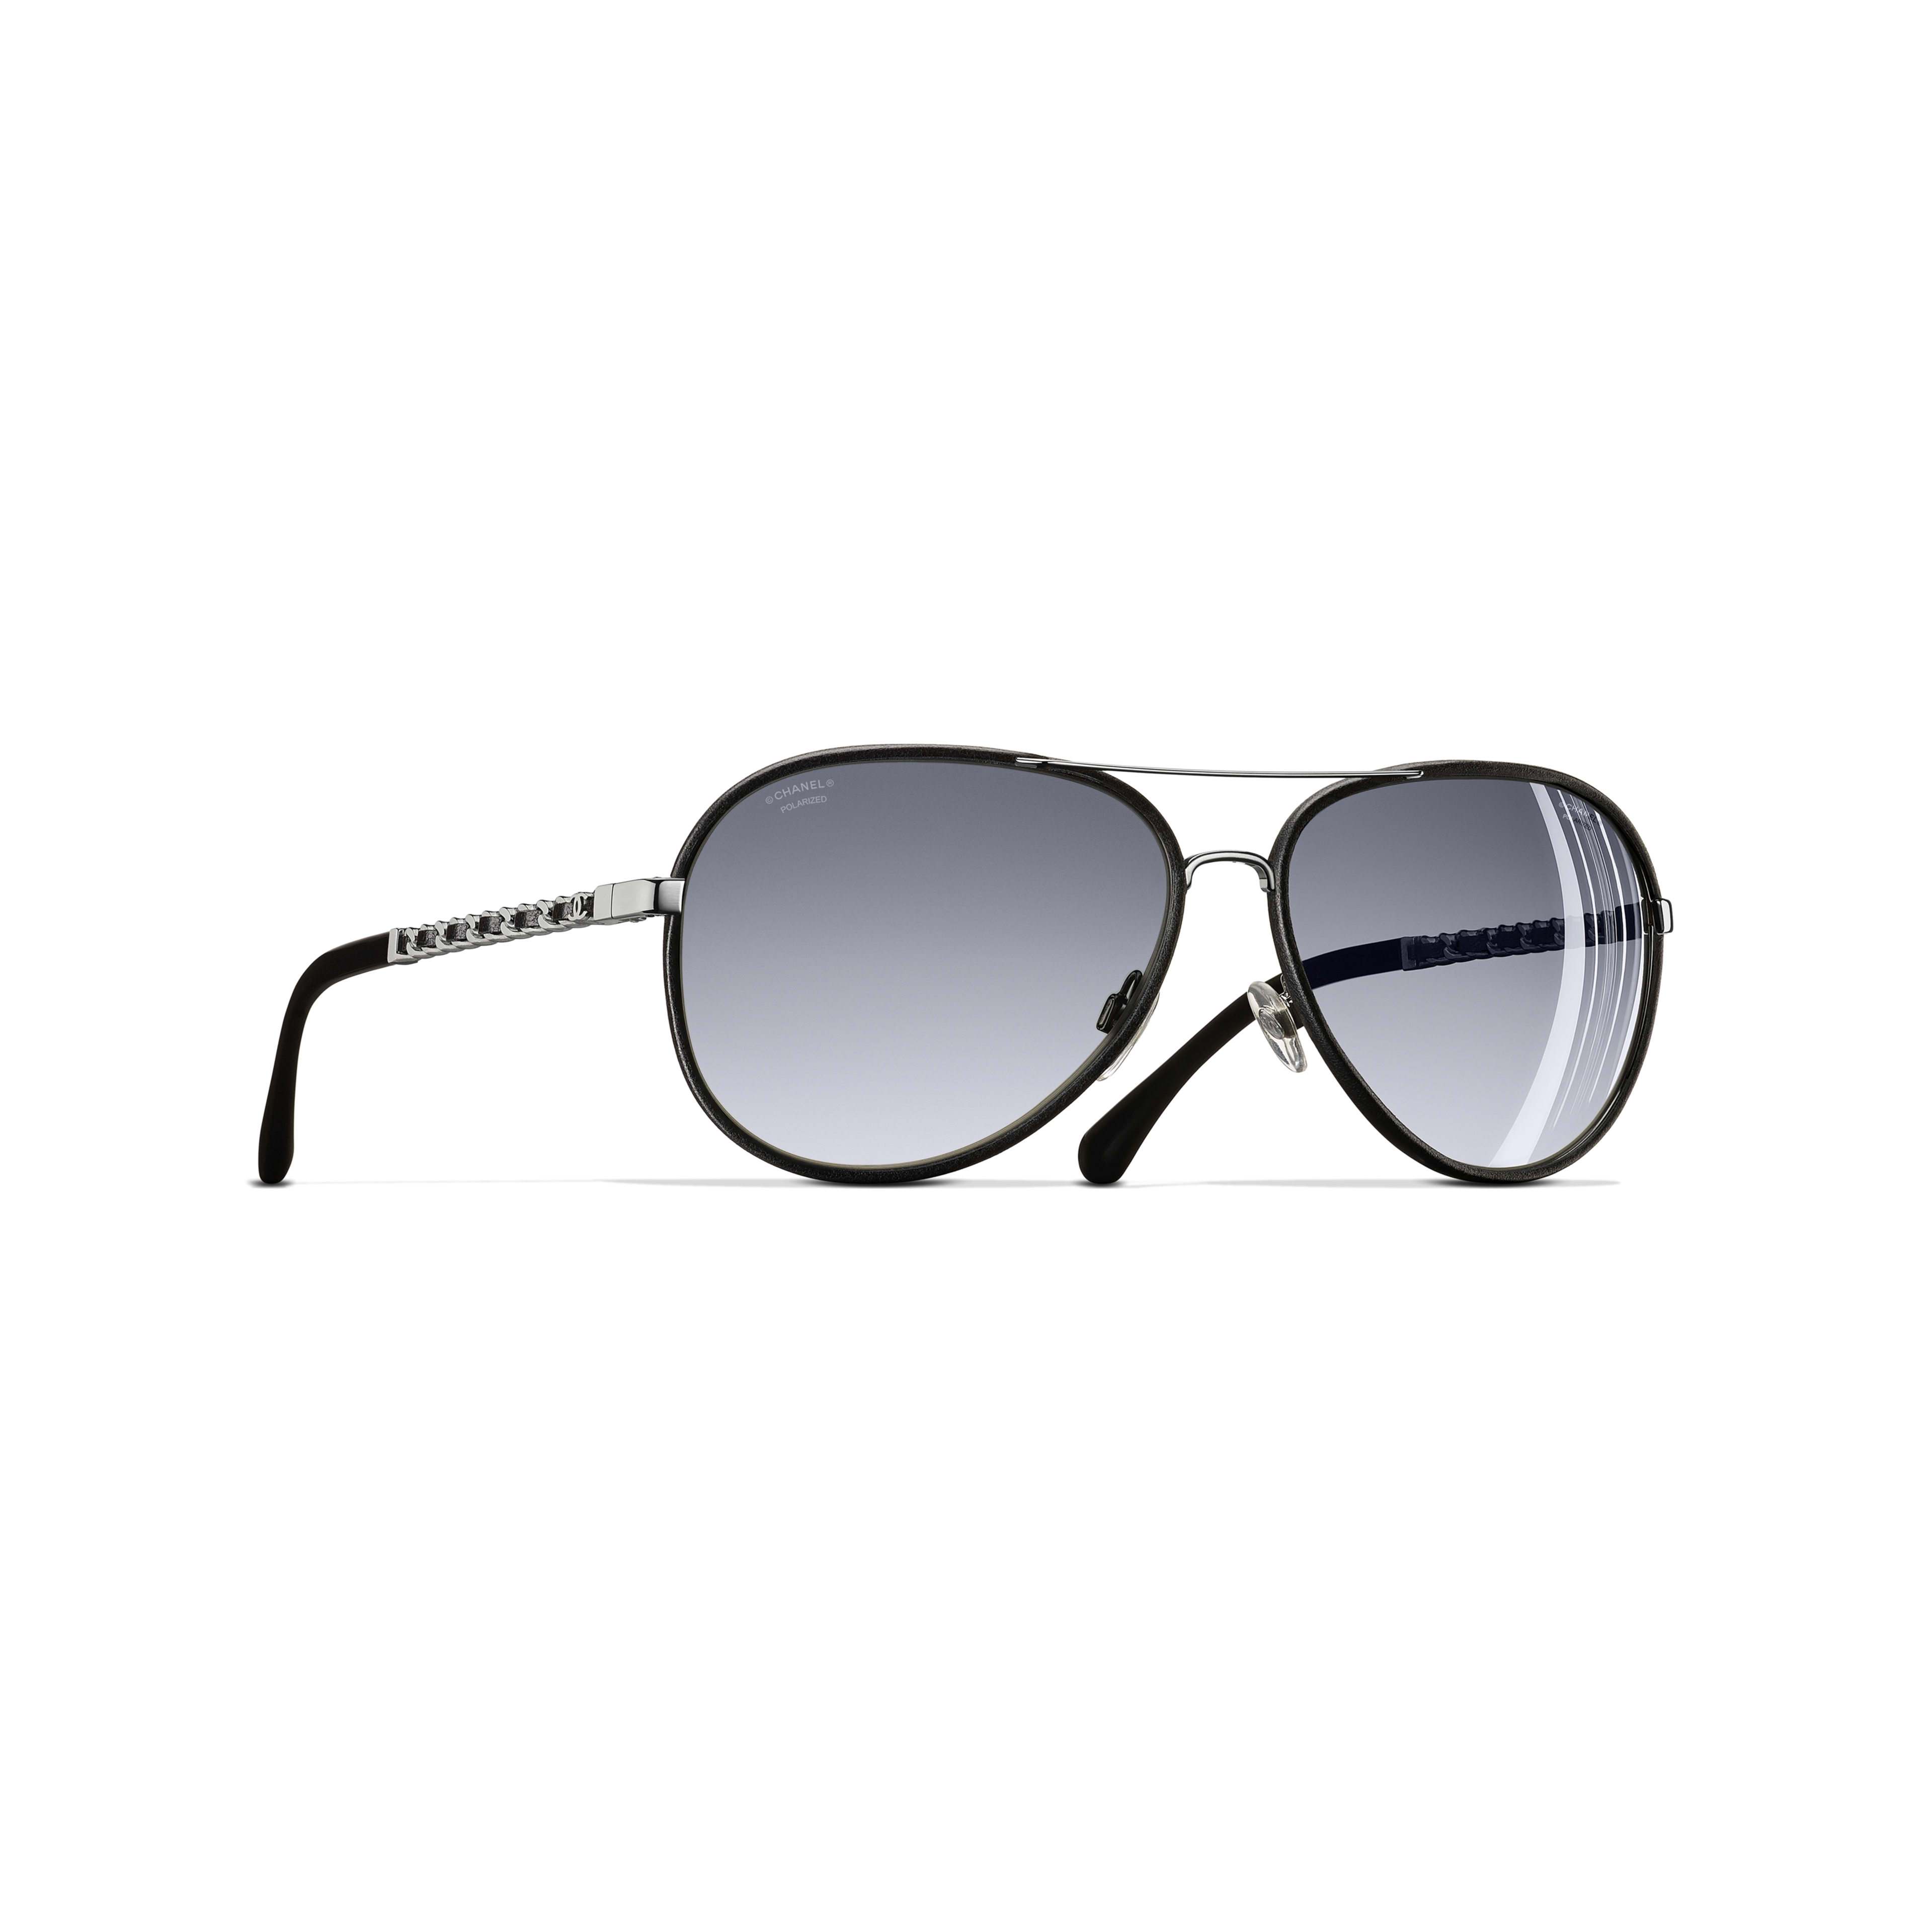 Pilot Sunglasses - Black - Metal & Calfskin - Polarized Lenses - Default view - see standard sized version